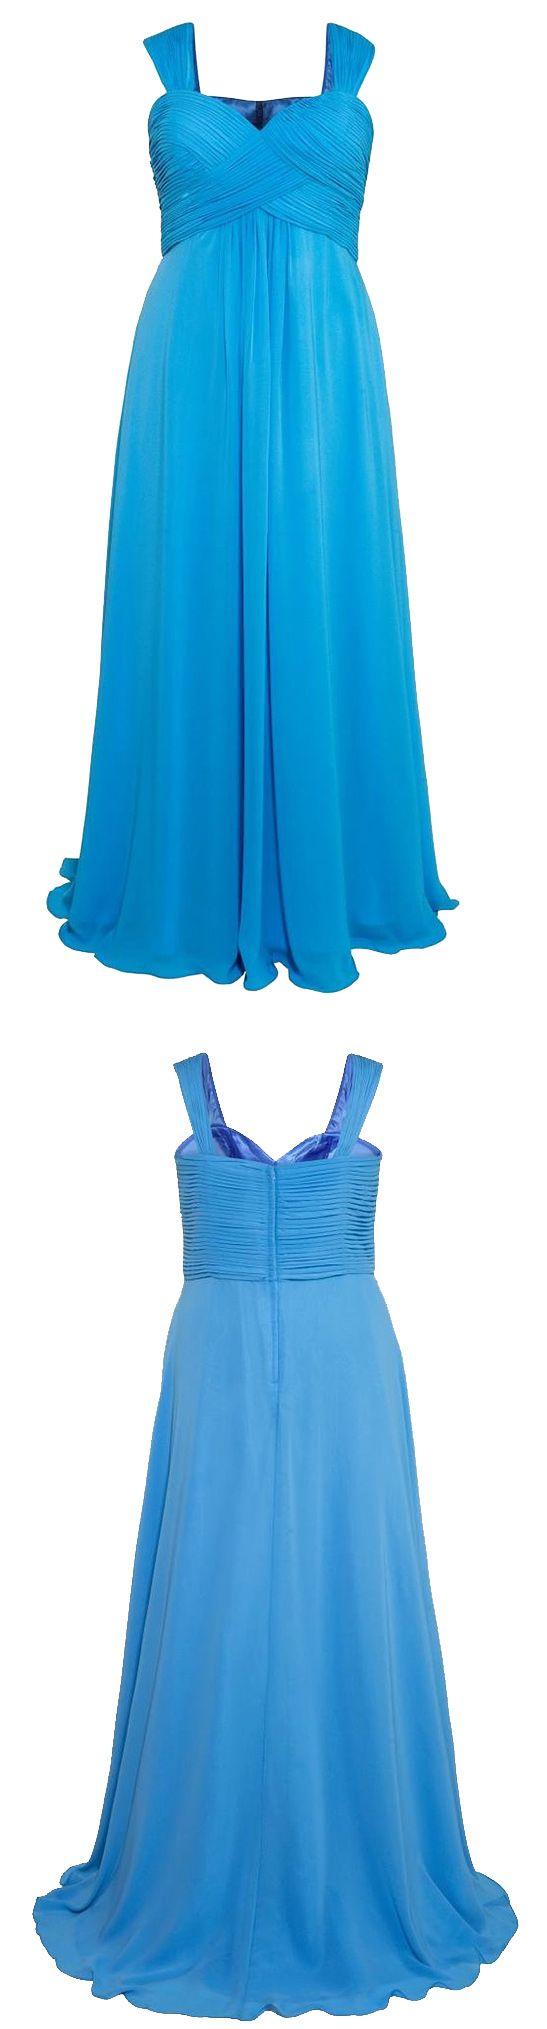 #long plus size bridesmaid dresses #bridesmaid dresses Plus size #elegant…